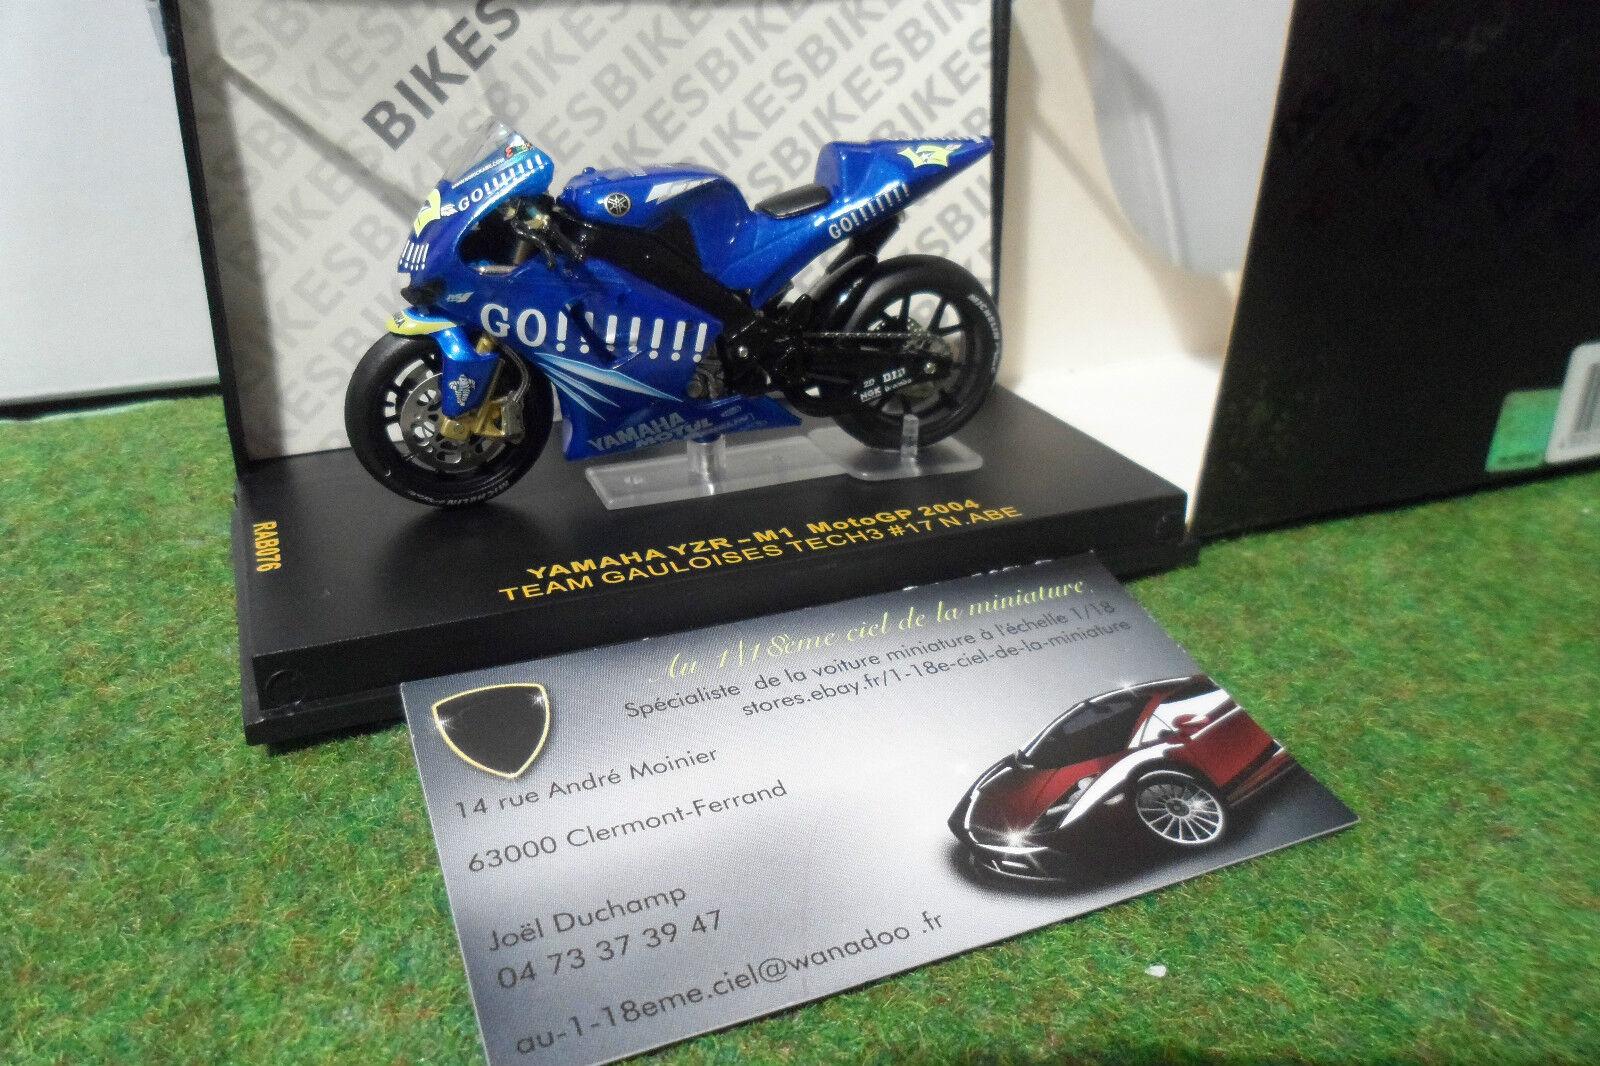 MOTO YAMAHA YZR-M1 GAULOISES MotoGP 2004 N. Abe 1 24 IXO RAB076 miniature